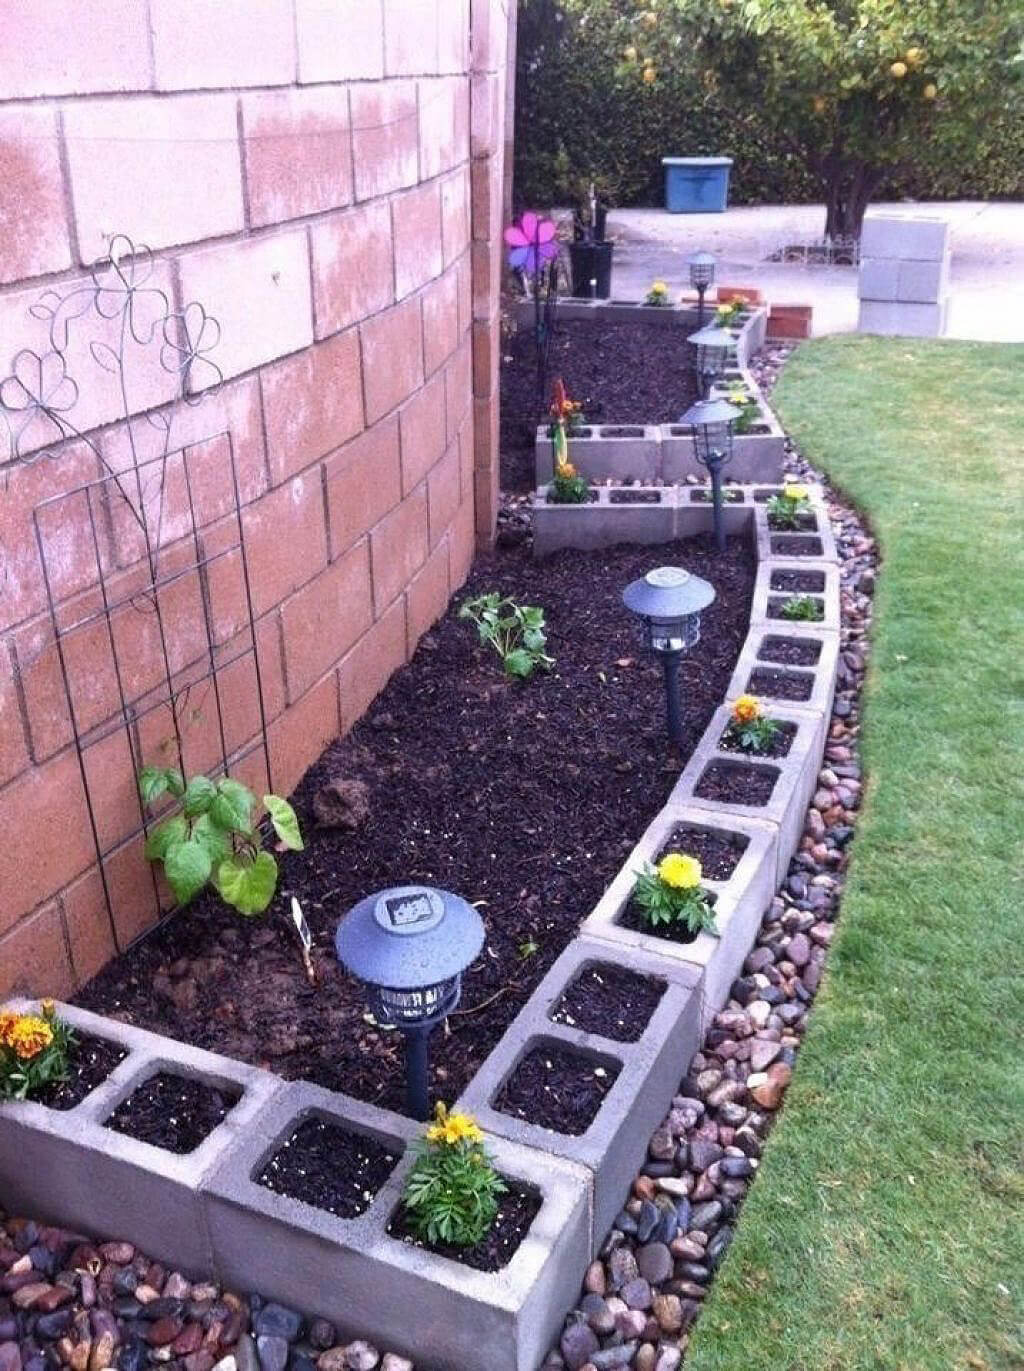 Versatile Cinder Block Planters and Garden Border